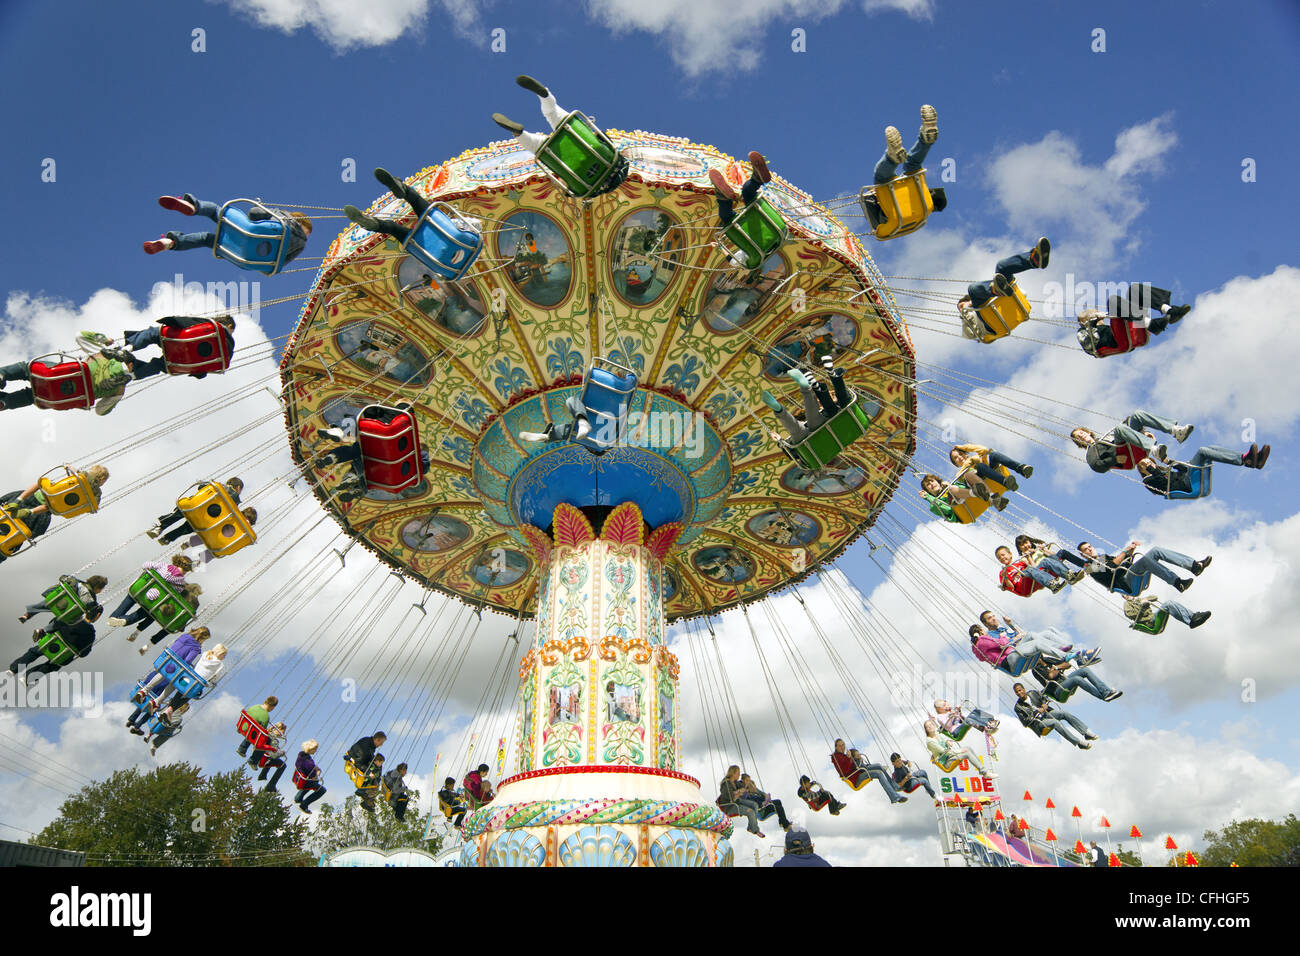 Families enjoying an amusement park ride at a carnival - Stock Image